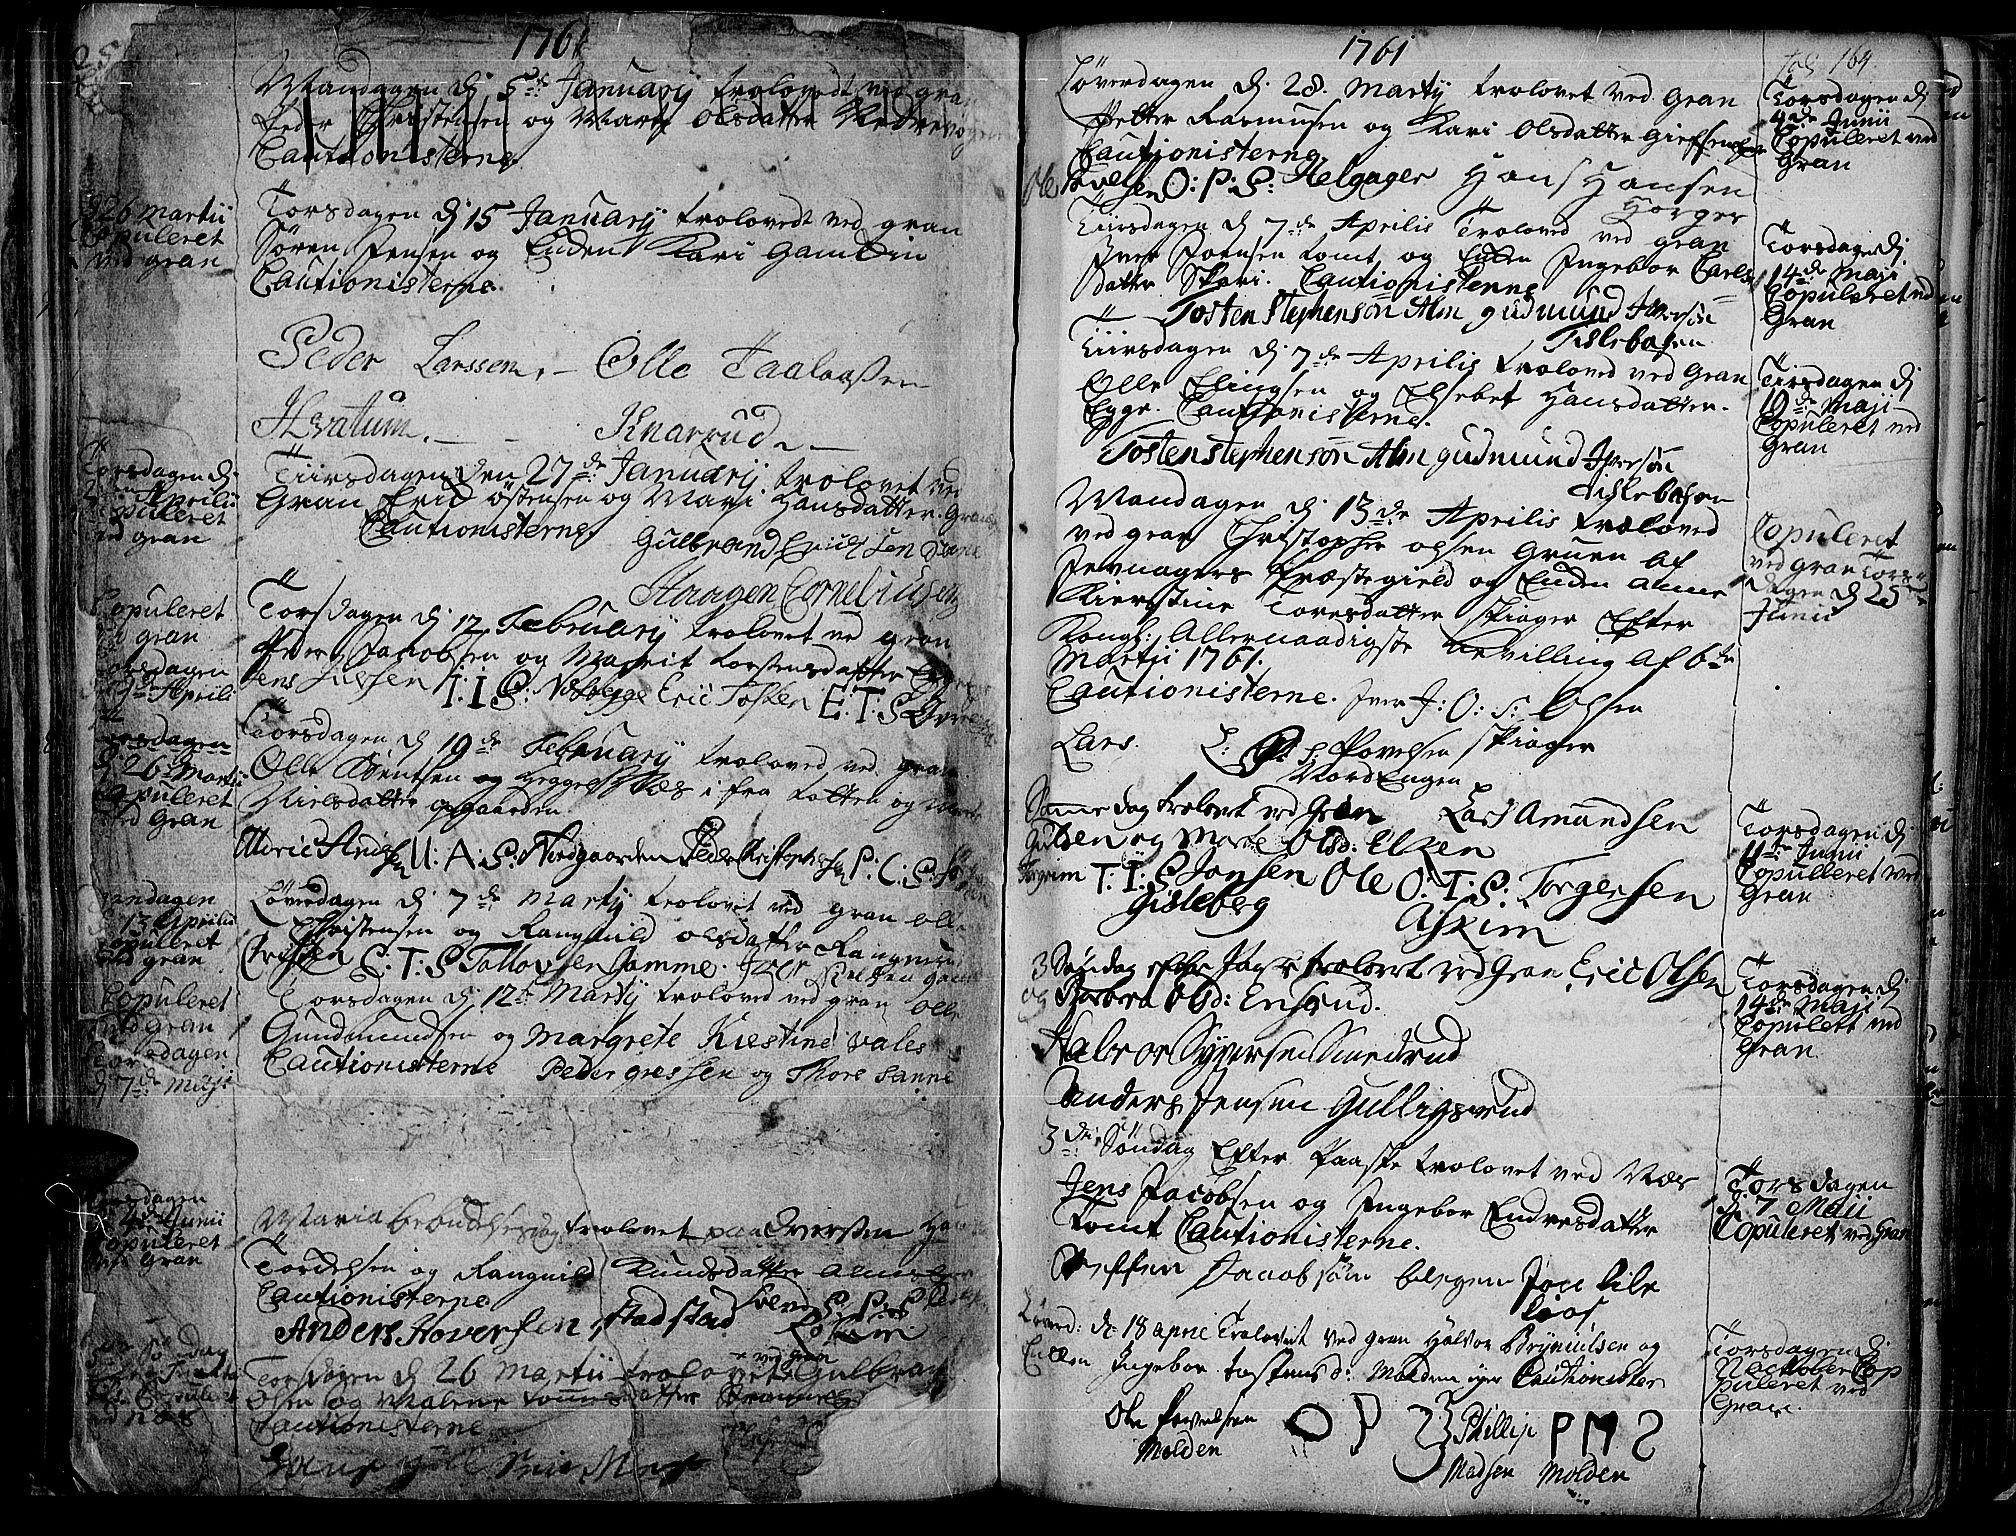 SAH, Gran prestekontor, Ministerialbok nr. 4, 1759-1775, s. 164